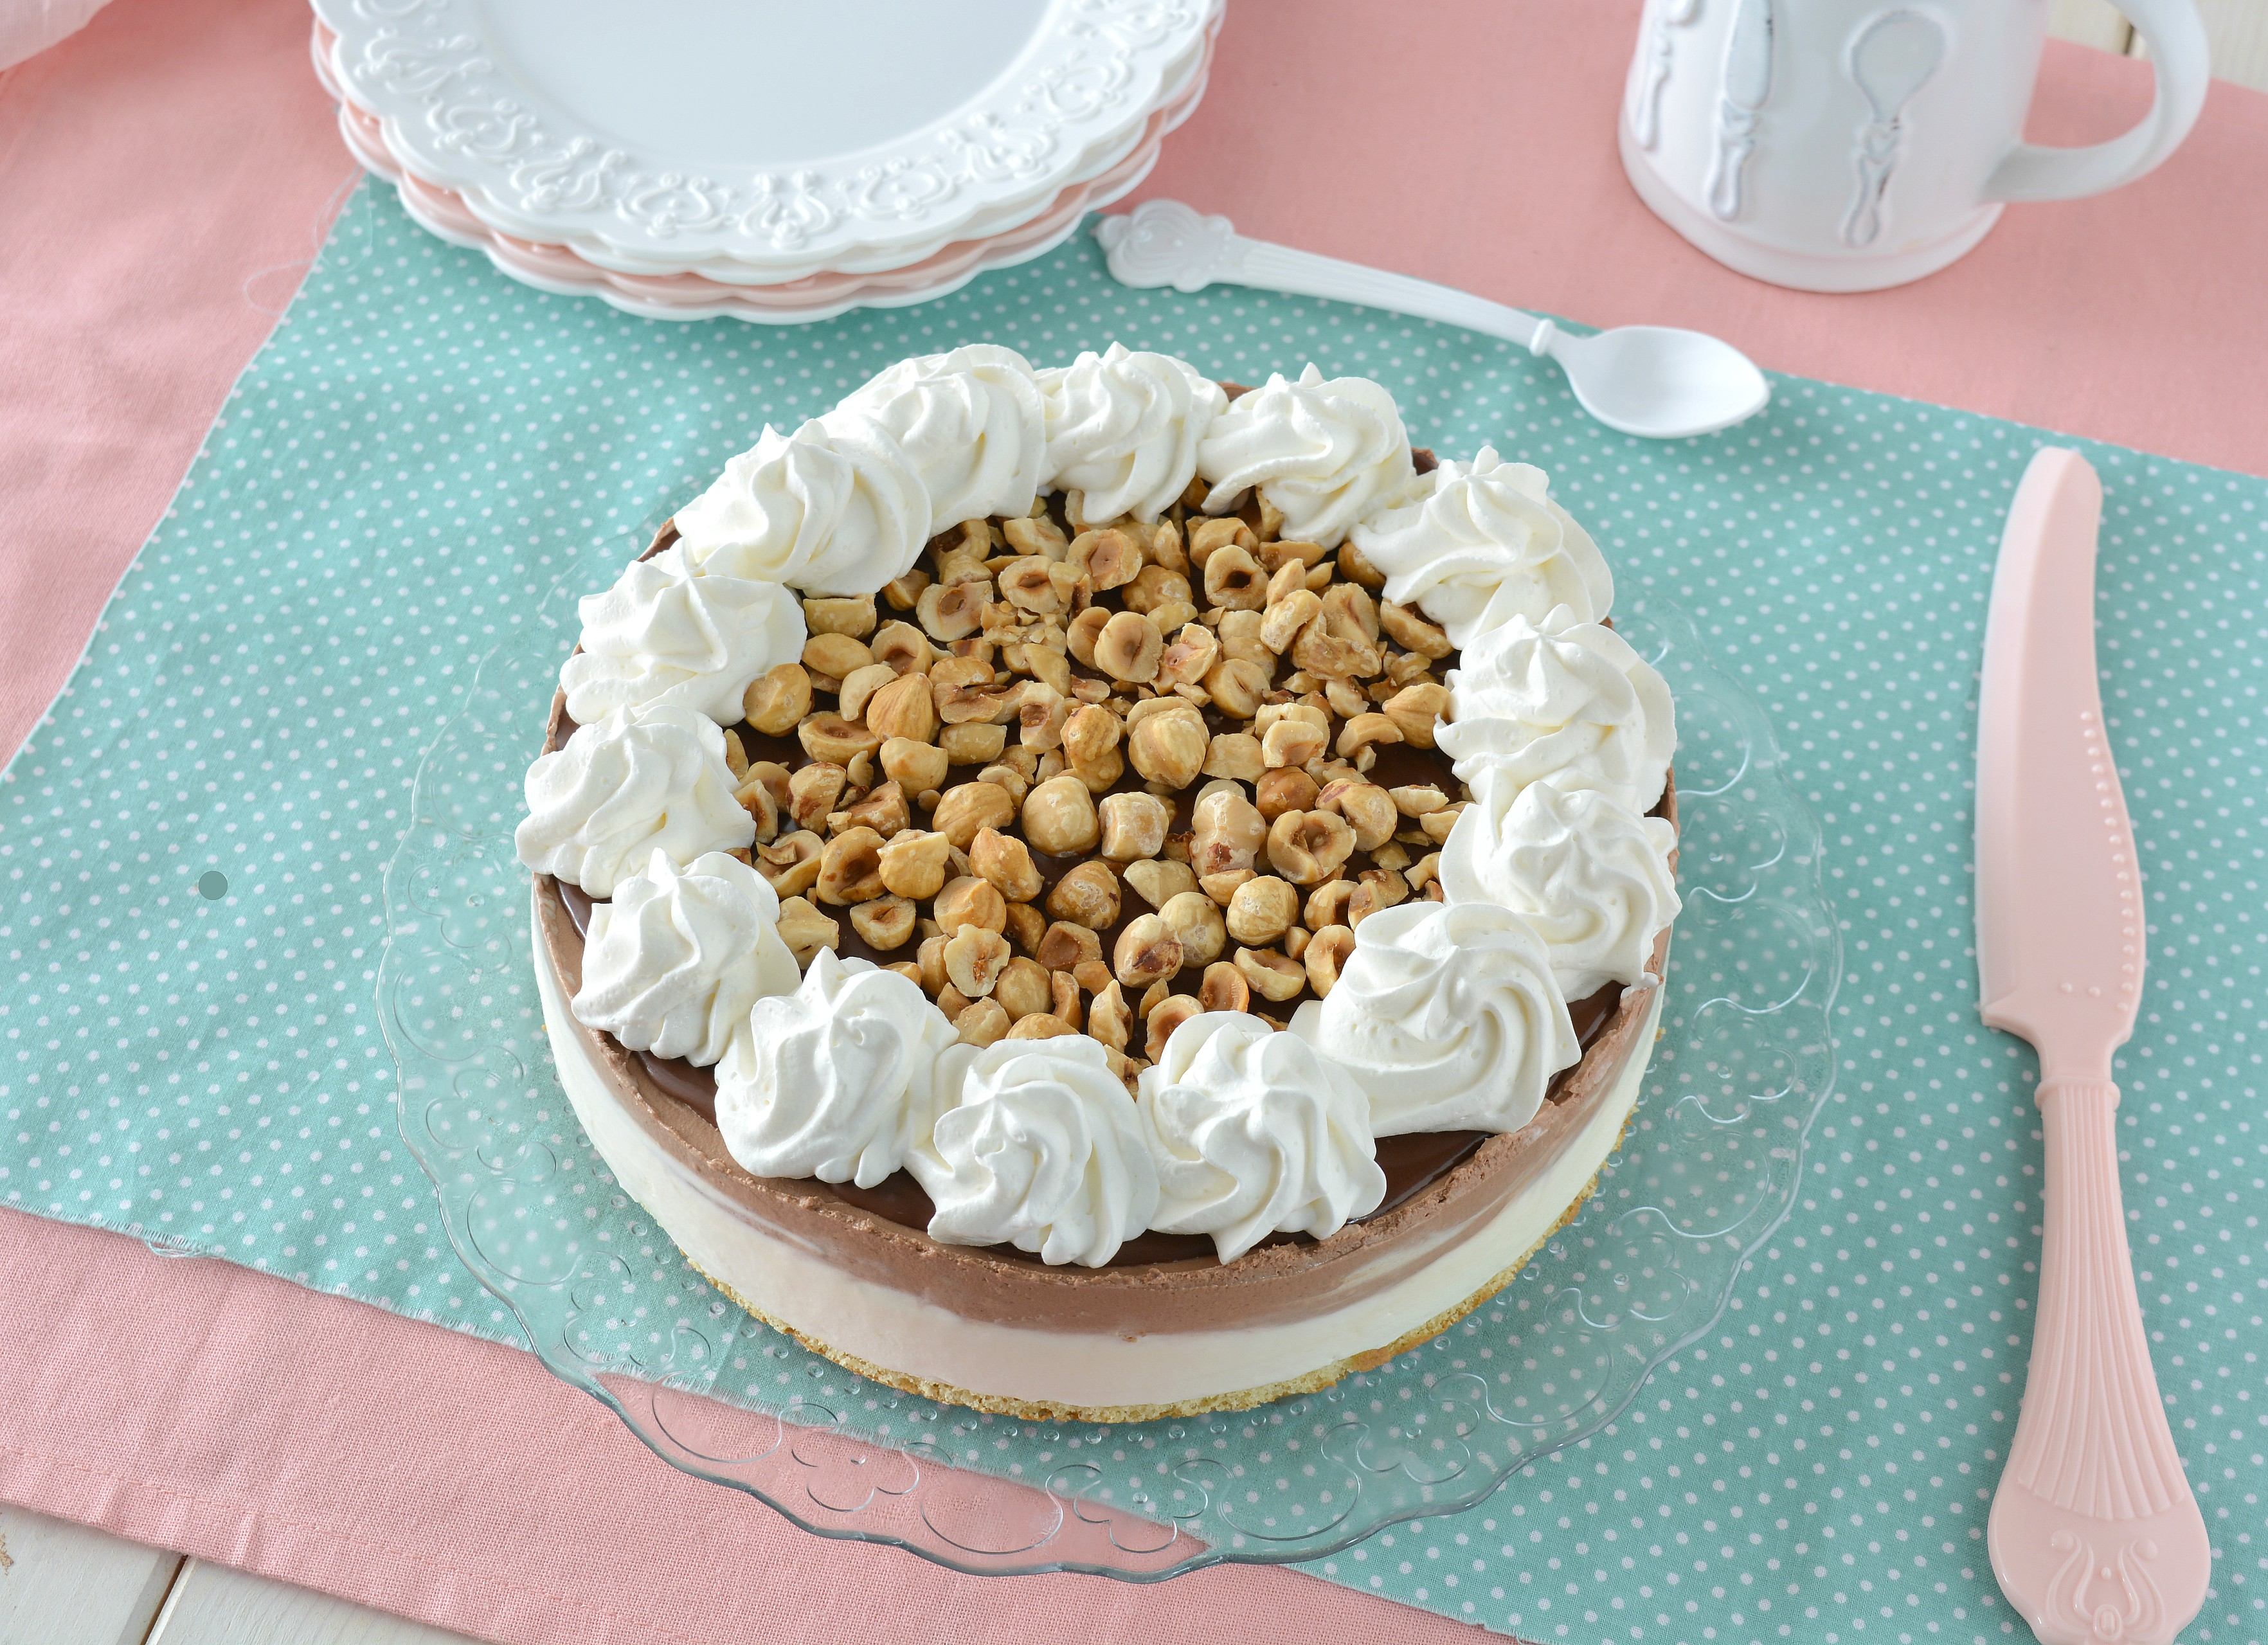 Torta gelato alla panna e cacao senza gelatiera